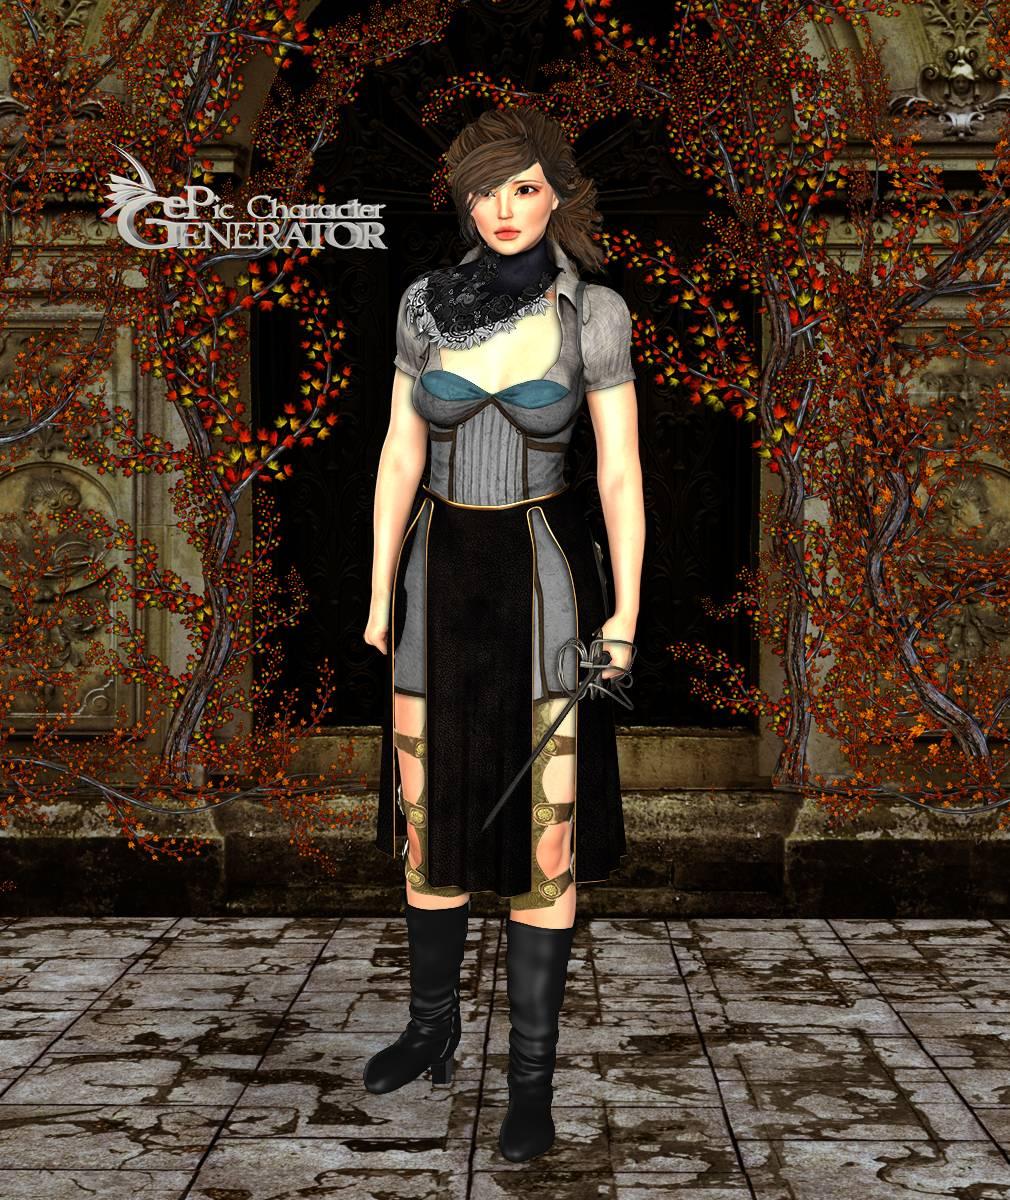 ePic Character Generator Season 2 Female Adventurer 2 Screenshot 01